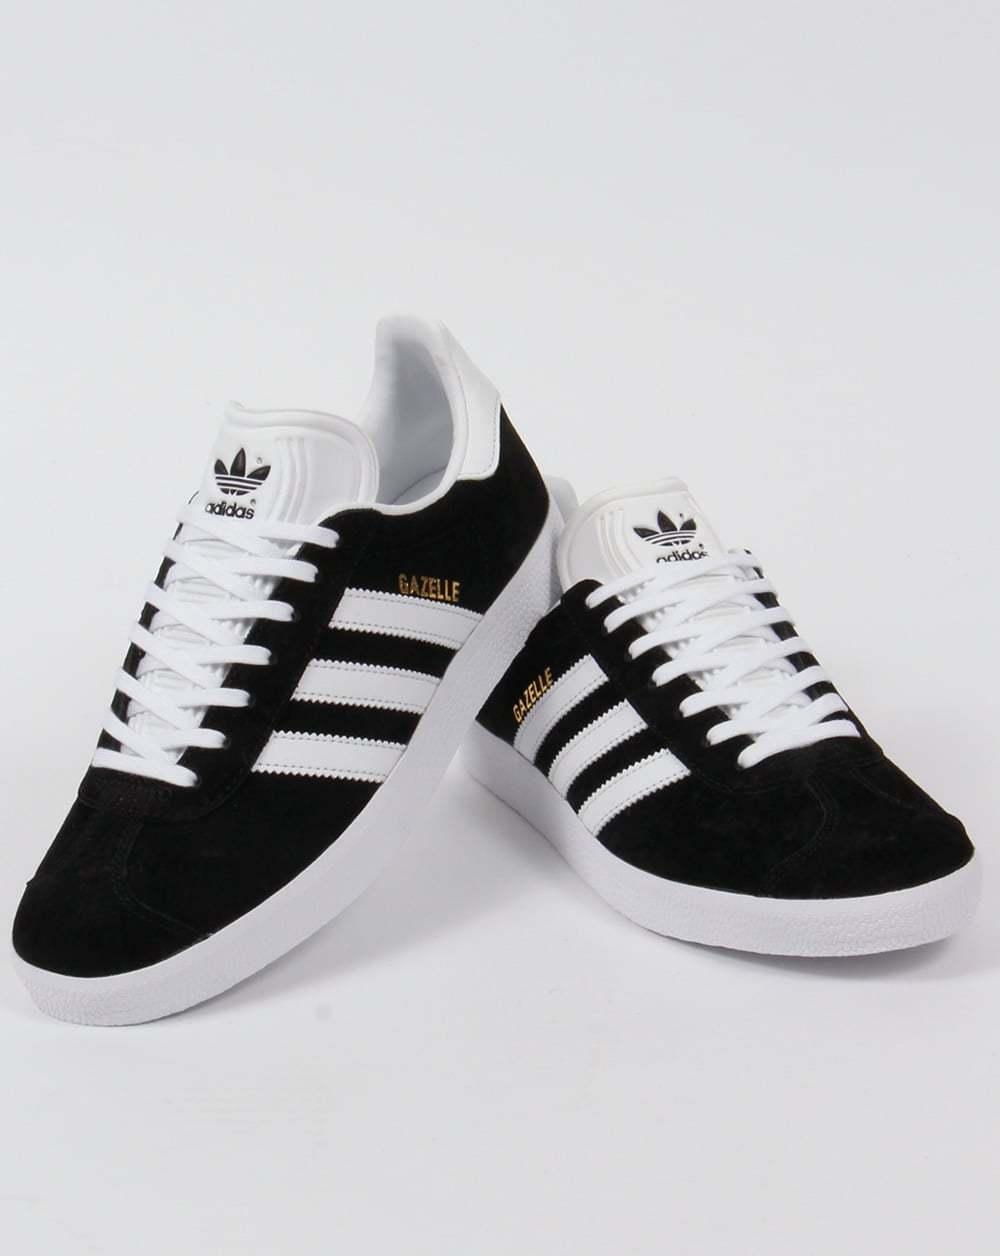 Adidas Superstar 2 homme Classic Retro Trainers blanc /  / blanc noir 2ce15b